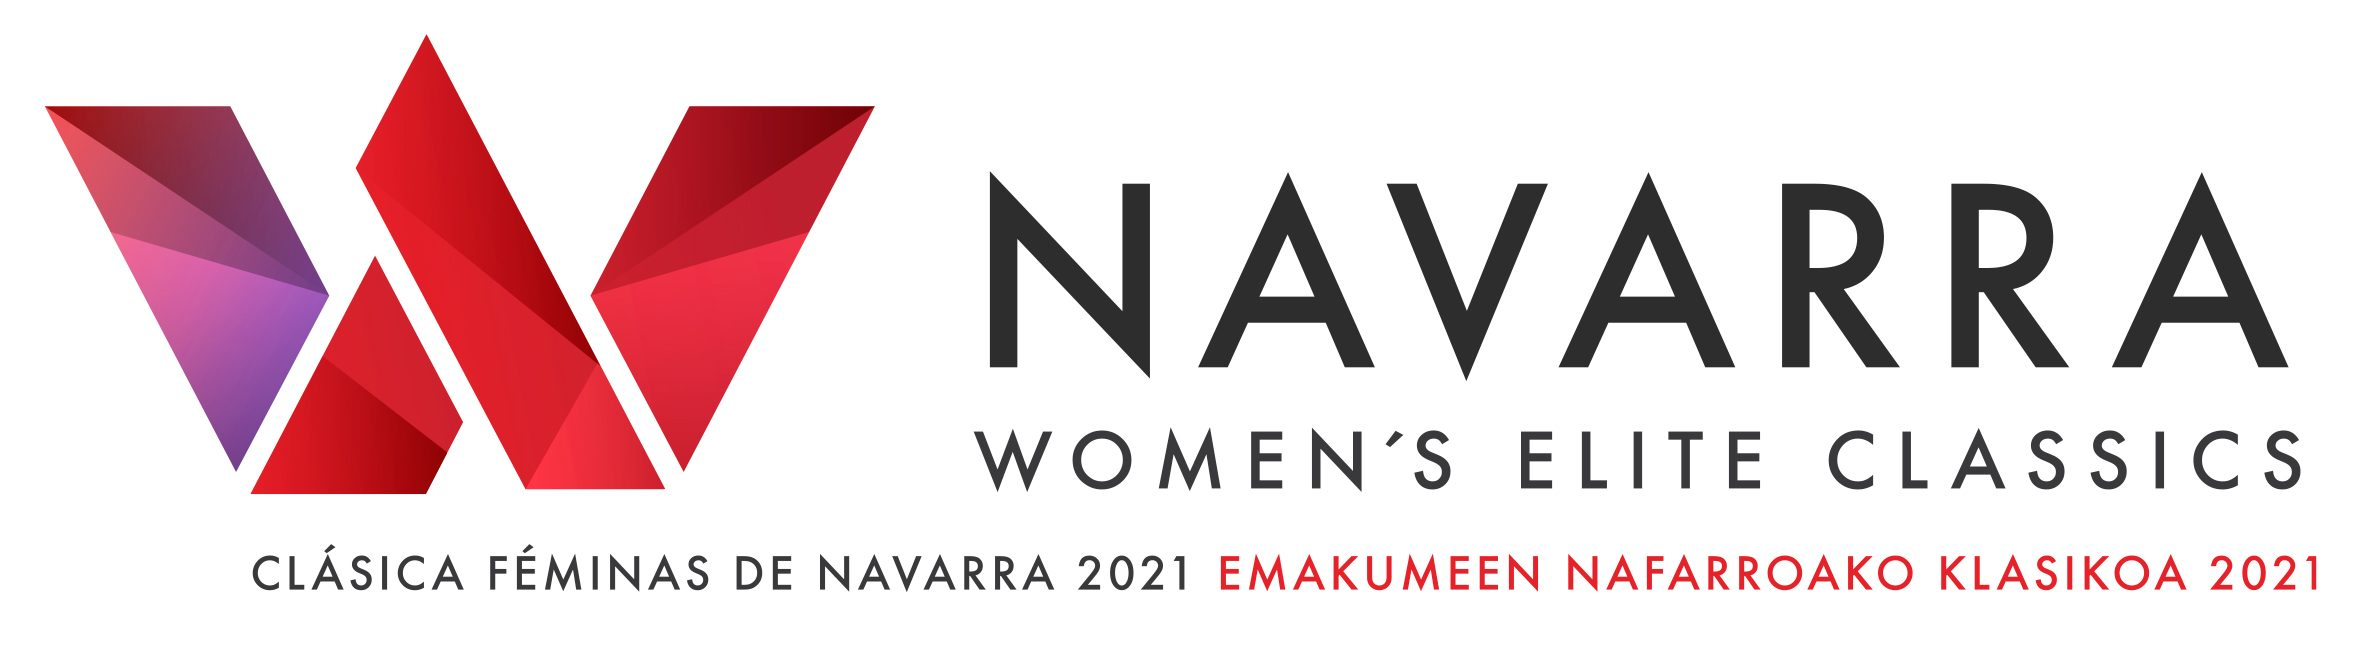 Navarra Womens Elite Classics